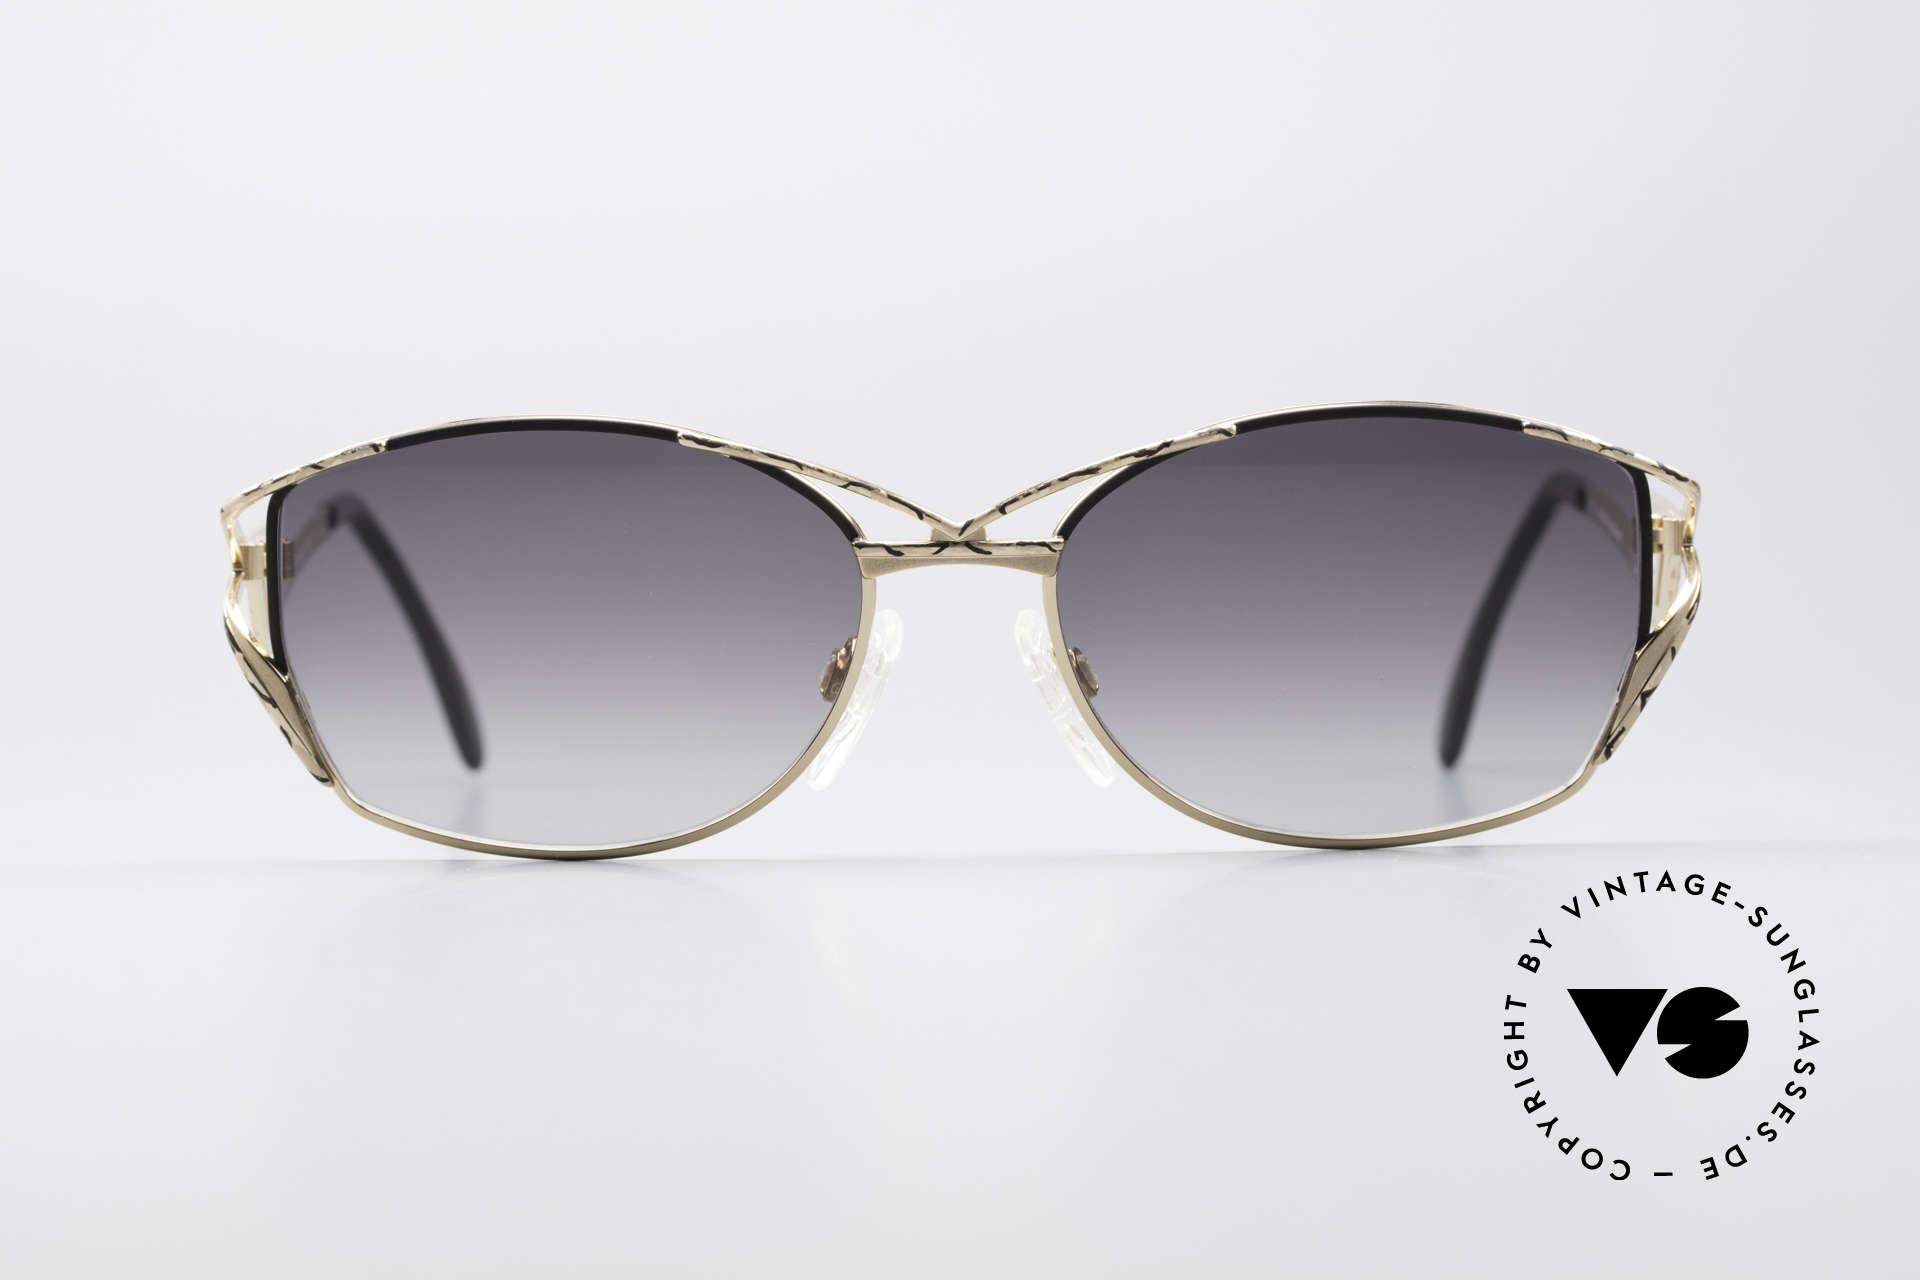 Cazal 284 Luxury Vintage Sunglasses 90's, designer sunglasses by CAri ZALloni (Mr. CAZAL), Made for Women